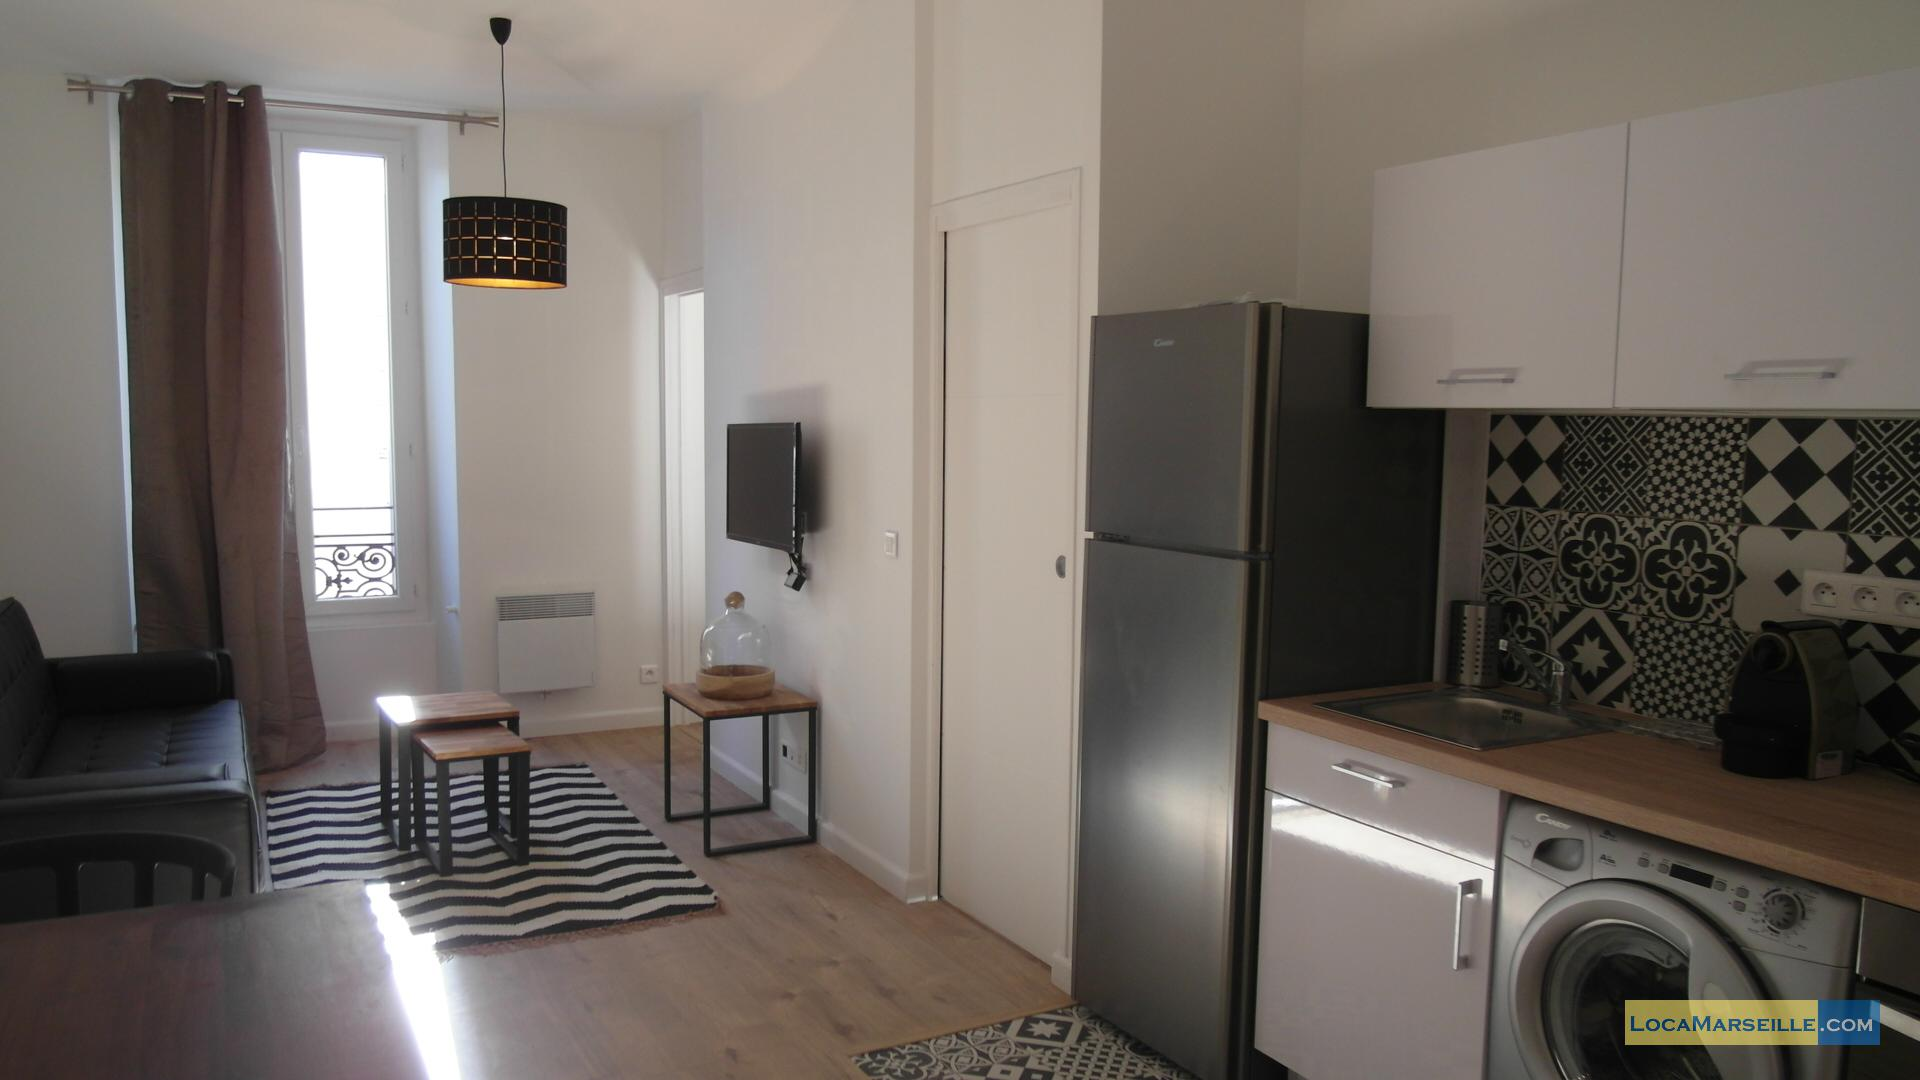 chambre meubl e marseille location. Black Bedroom Furniture Sets. Home Design Ideas